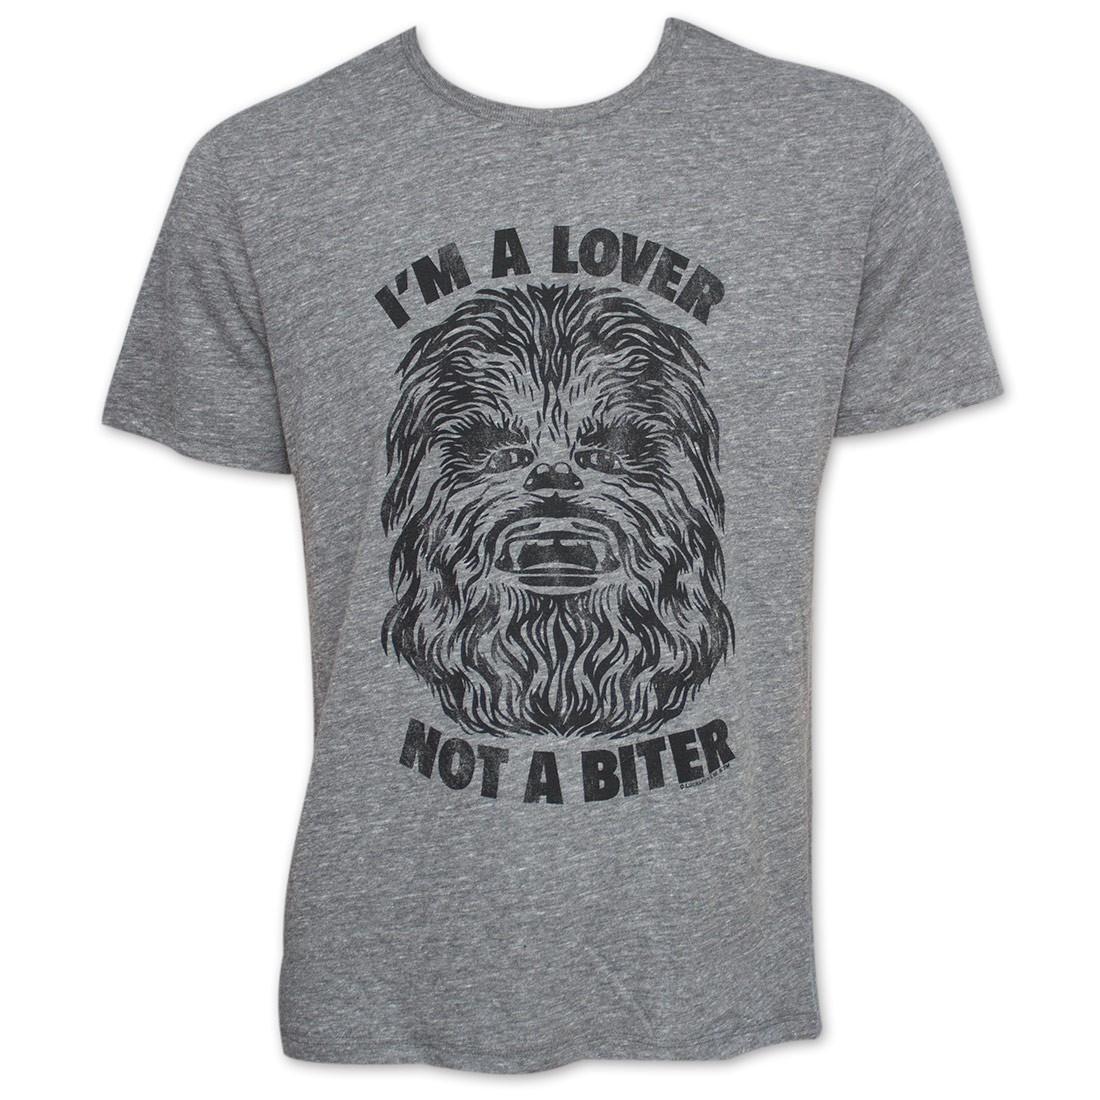 Men S Star Wars Lover Not A Biter Chewbacca Junk Food Tshirt